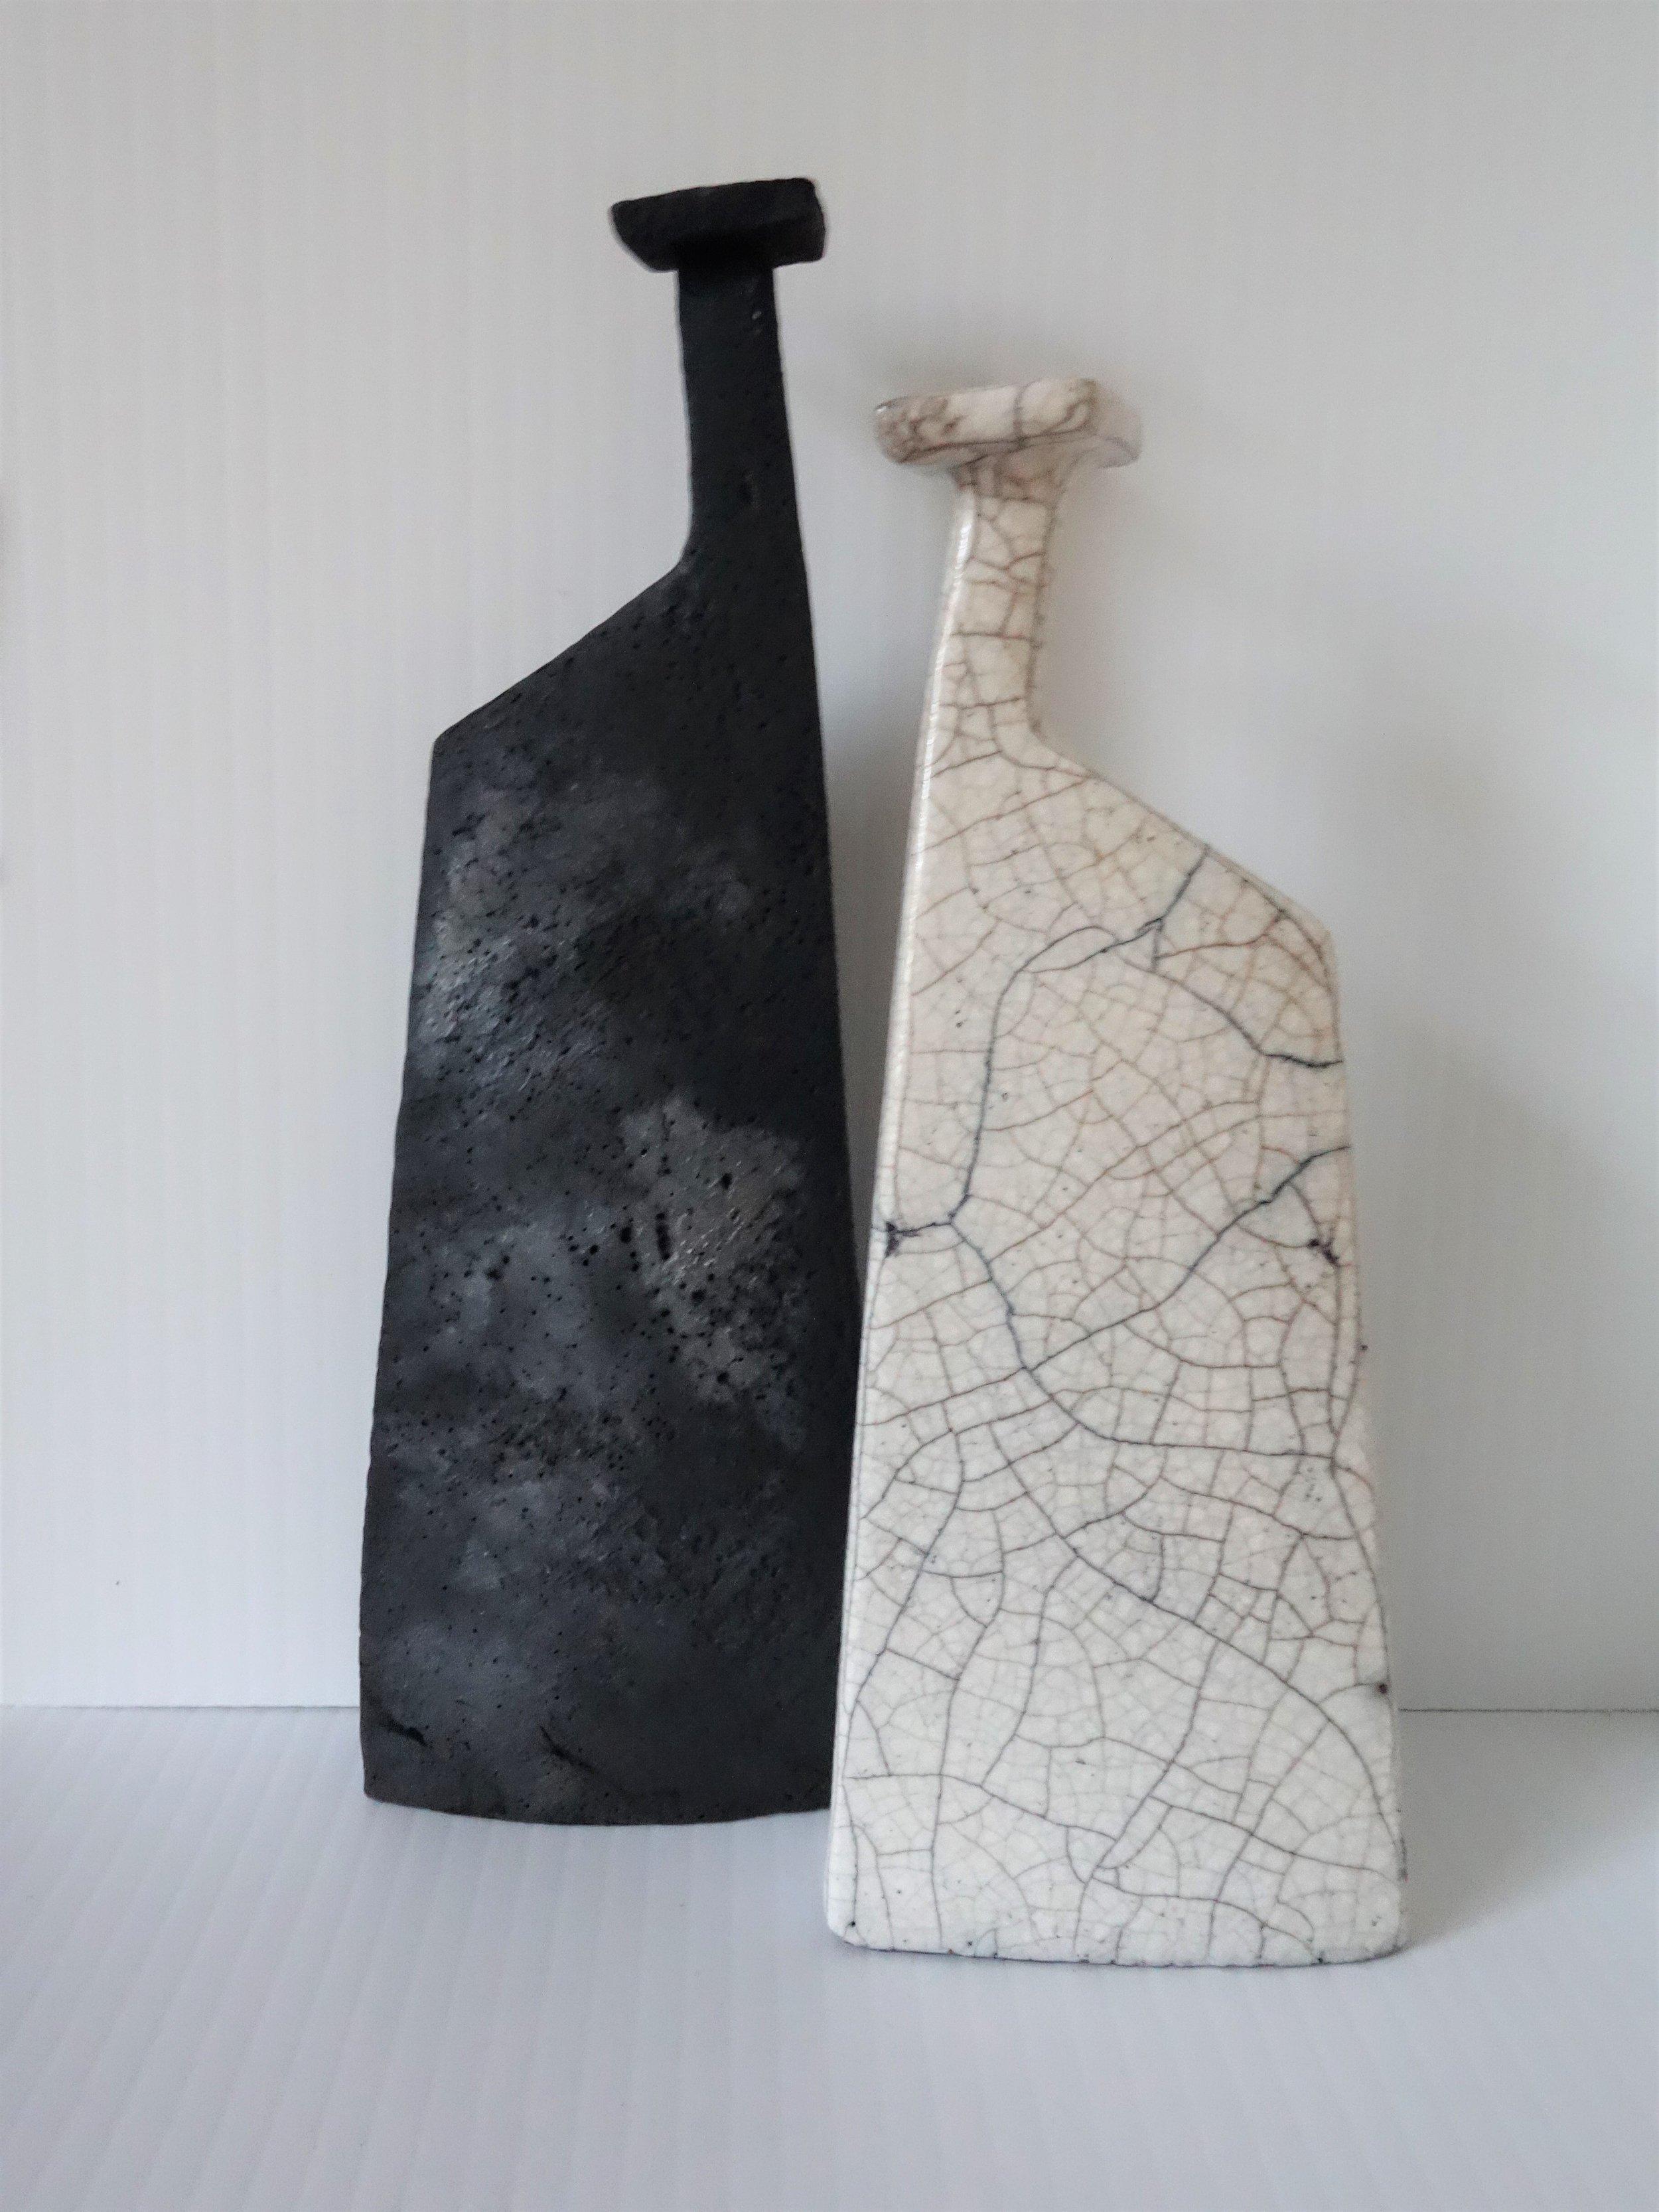 (LEFT)  Title: Matt Black Bottle (square top) Size: 19 cm (h) x 7 cm (w) Medium: Smoke Fired Price: £90  (RIGHT) Title: White Raku Bottle (square top) Size: 17 cm (h) x 7 cm (w) Medium: Raku  Price: £90